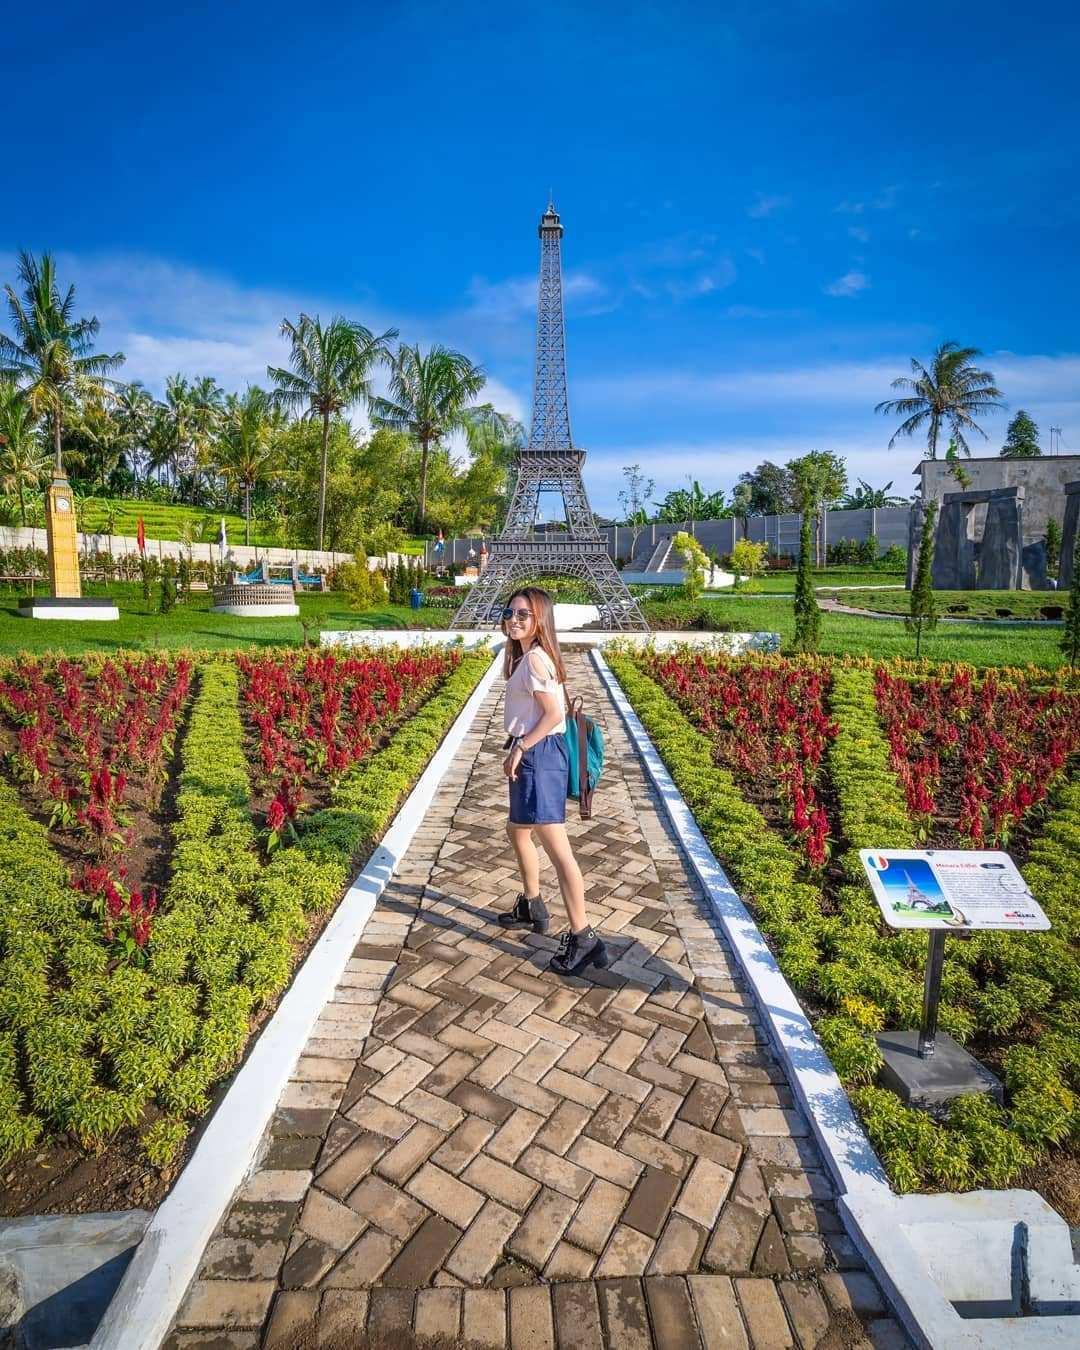 Berfoto Dengan Background Miniatur Menara Eifel di Taman Mini Mania Semarang, Image From @wisatasemarang